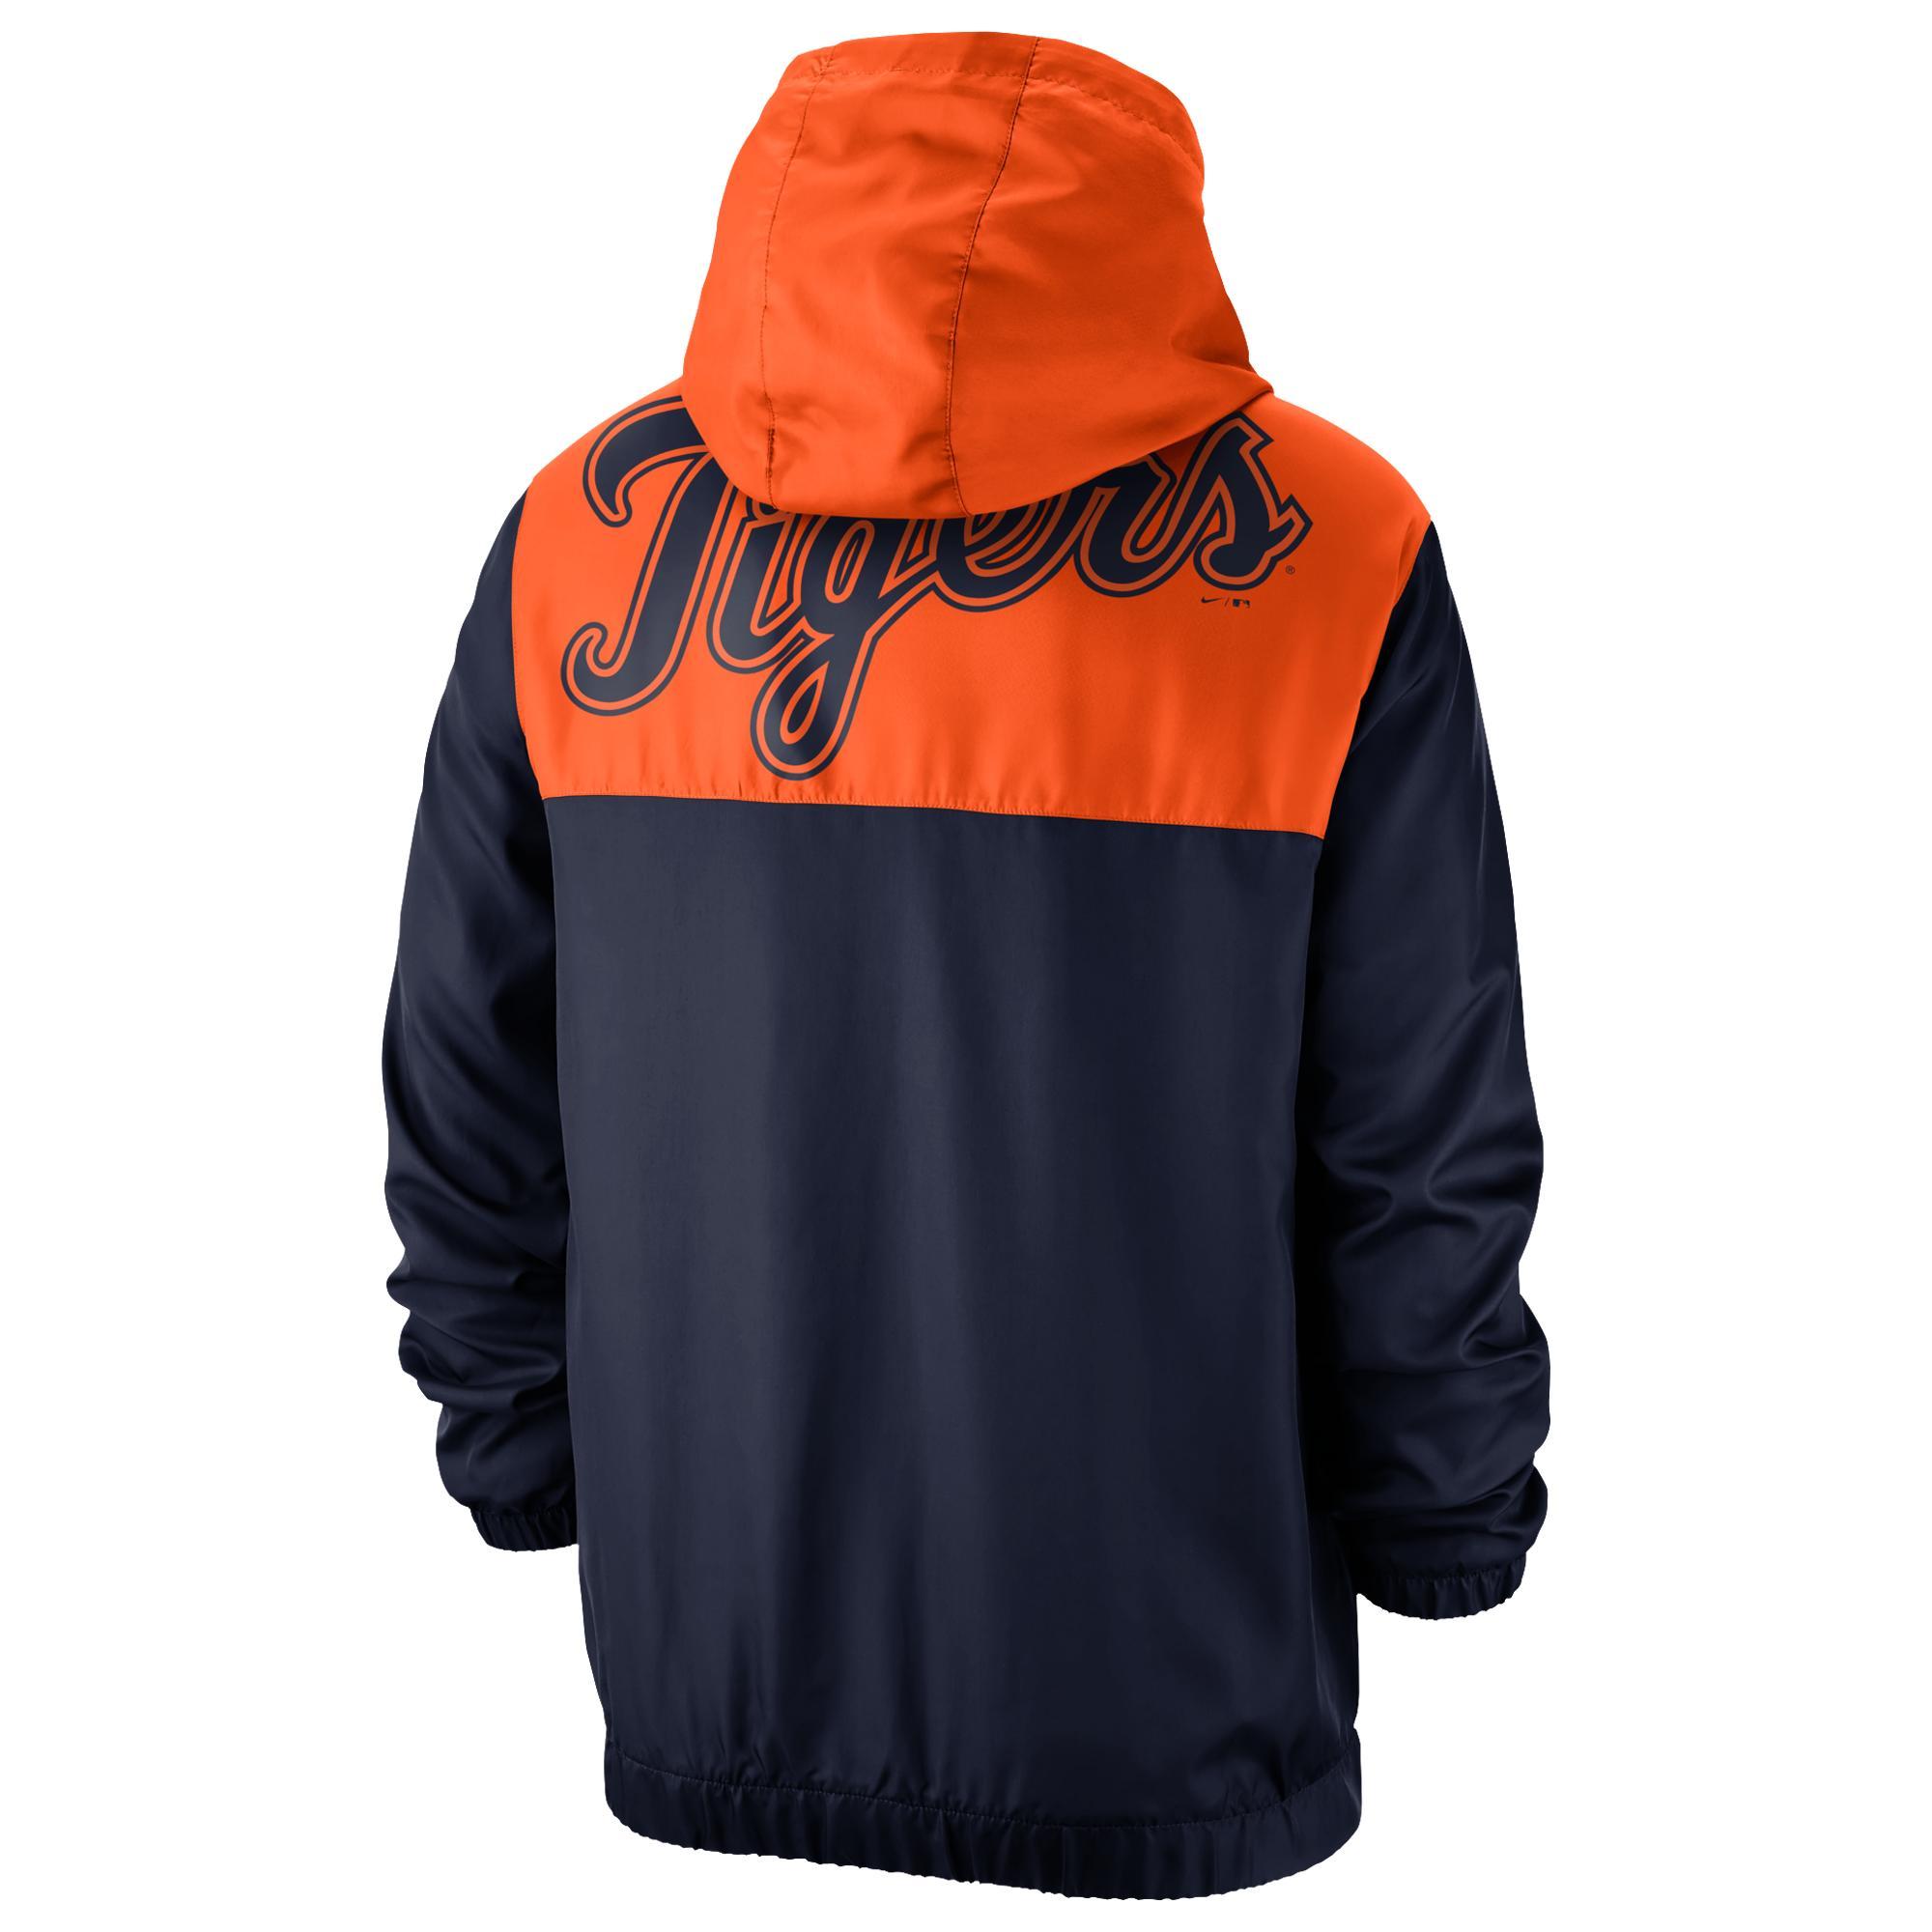 size 40 c0316 1b530 Nike Detroit Tigers Mlb Workout 1/2 Zip Anorak Jacket in ...